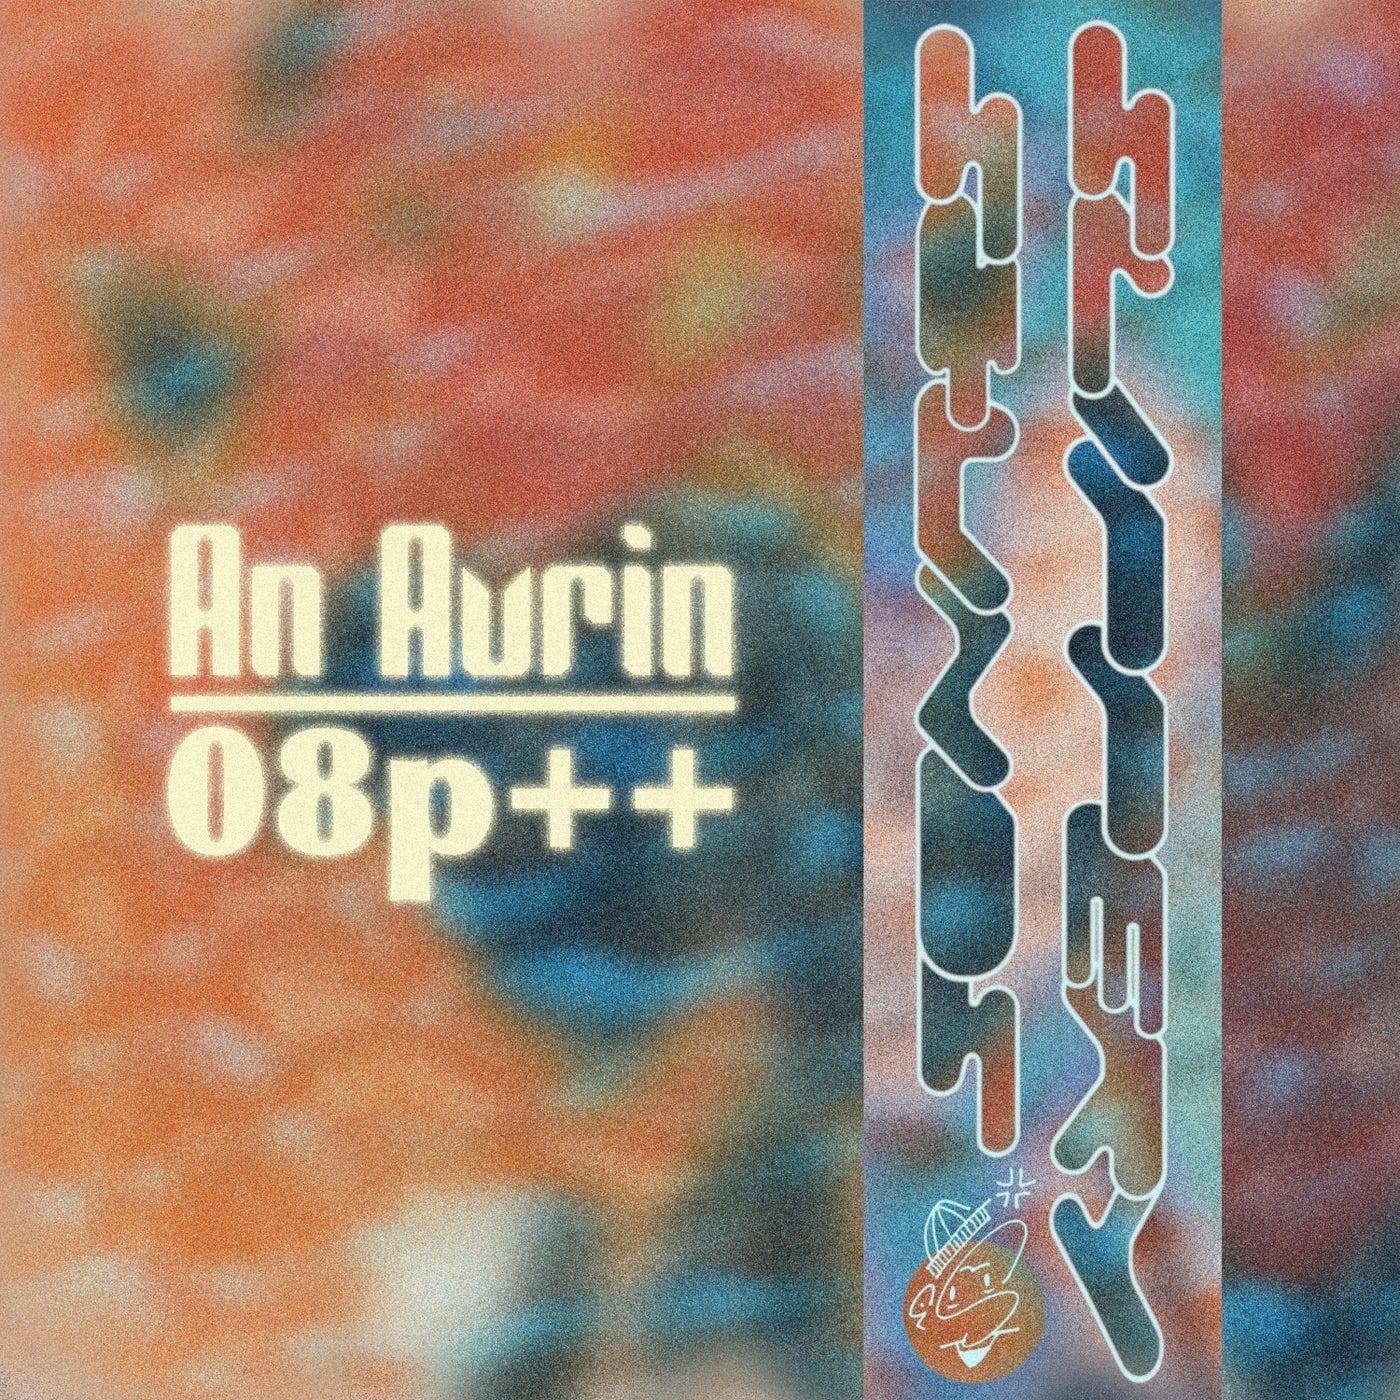 08p++ (Original Mix)